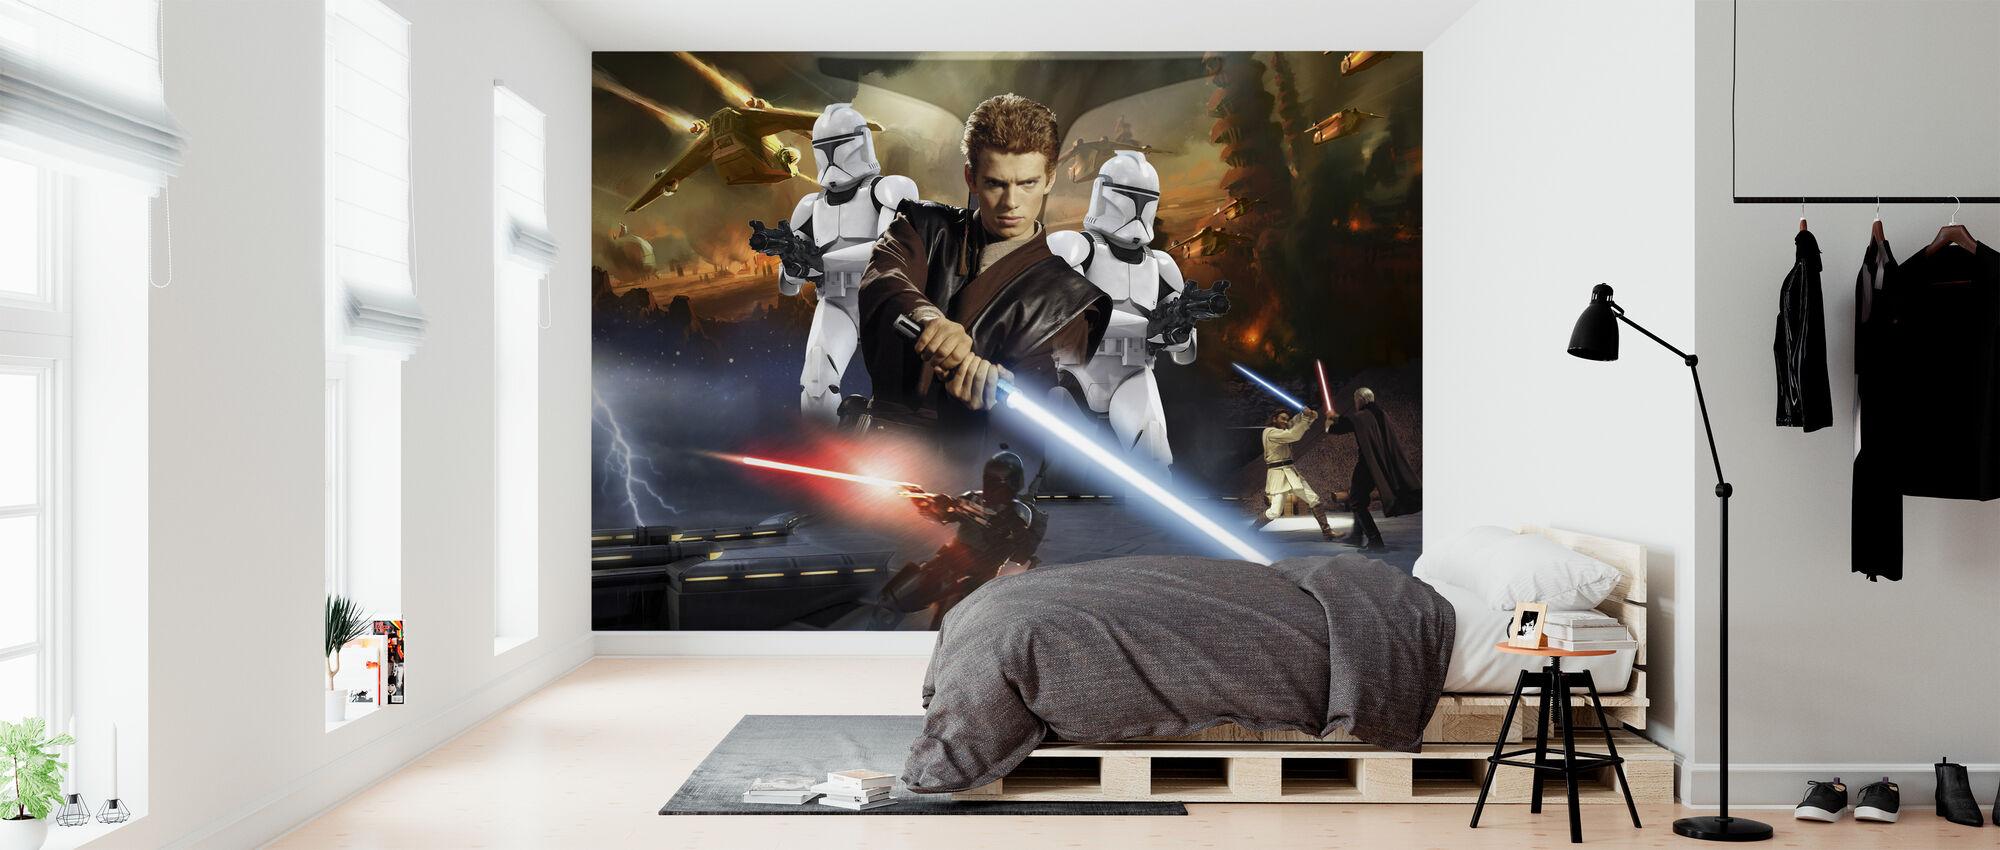 Star Wars - Anakin Skywalker ja klooni Troopers - Tapetti - Makuuhuone